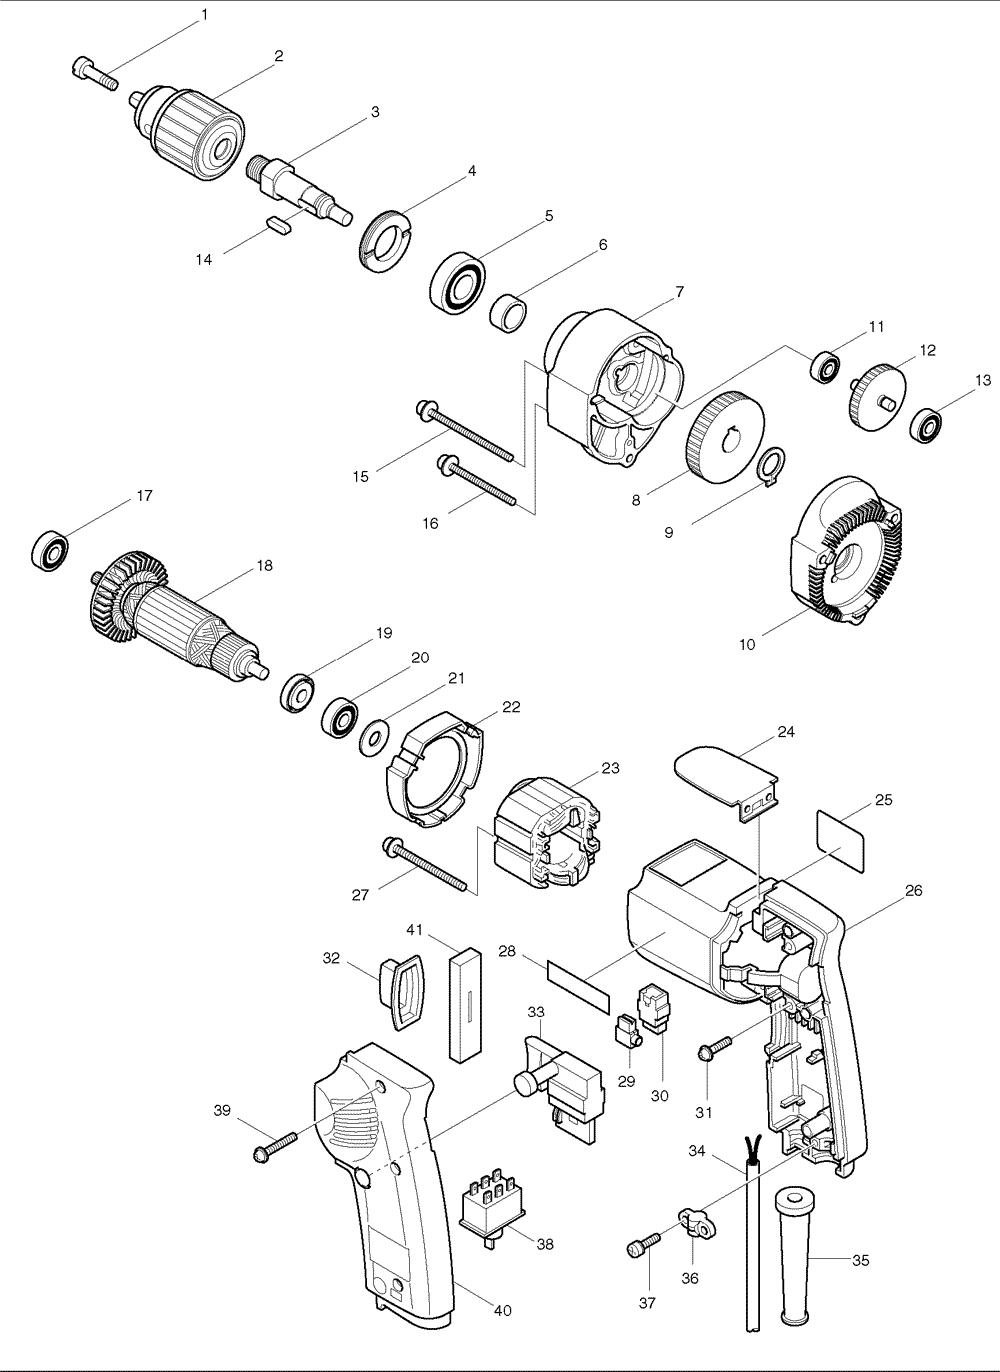 Makita 6302H Parts Schematic